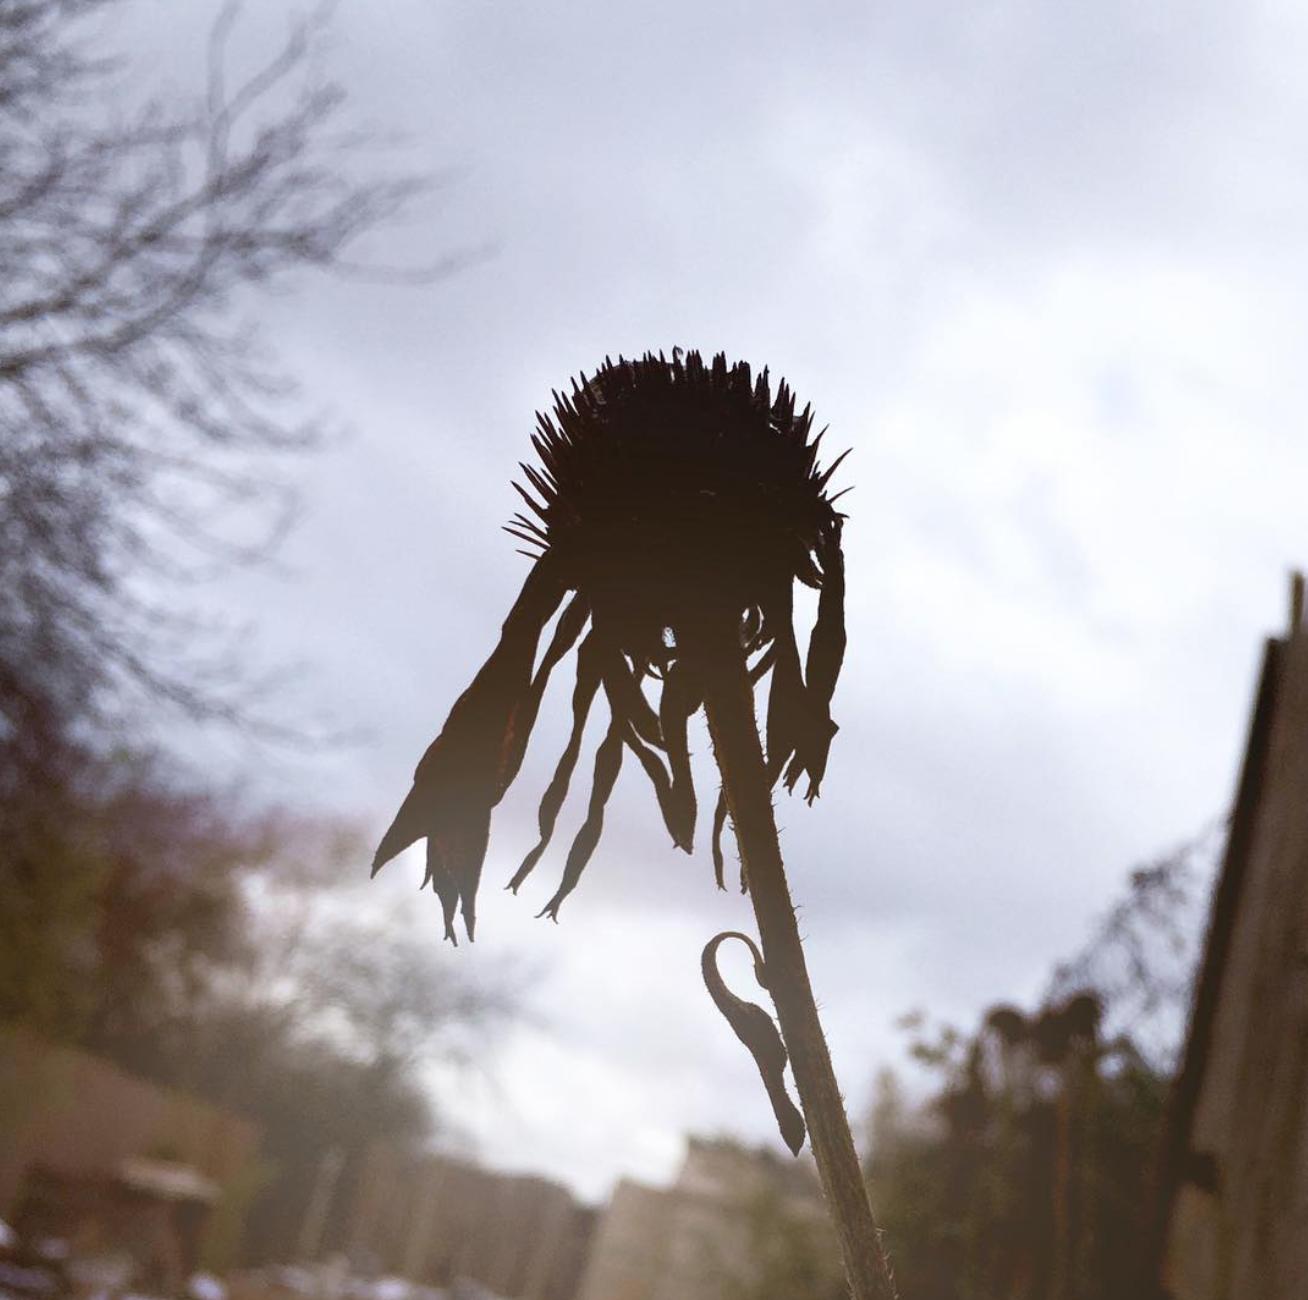 Echinacea-purpursonnenhut-sonnenhut-Wildkräuter-sammeln-Tee-selbst-herstellen-diy